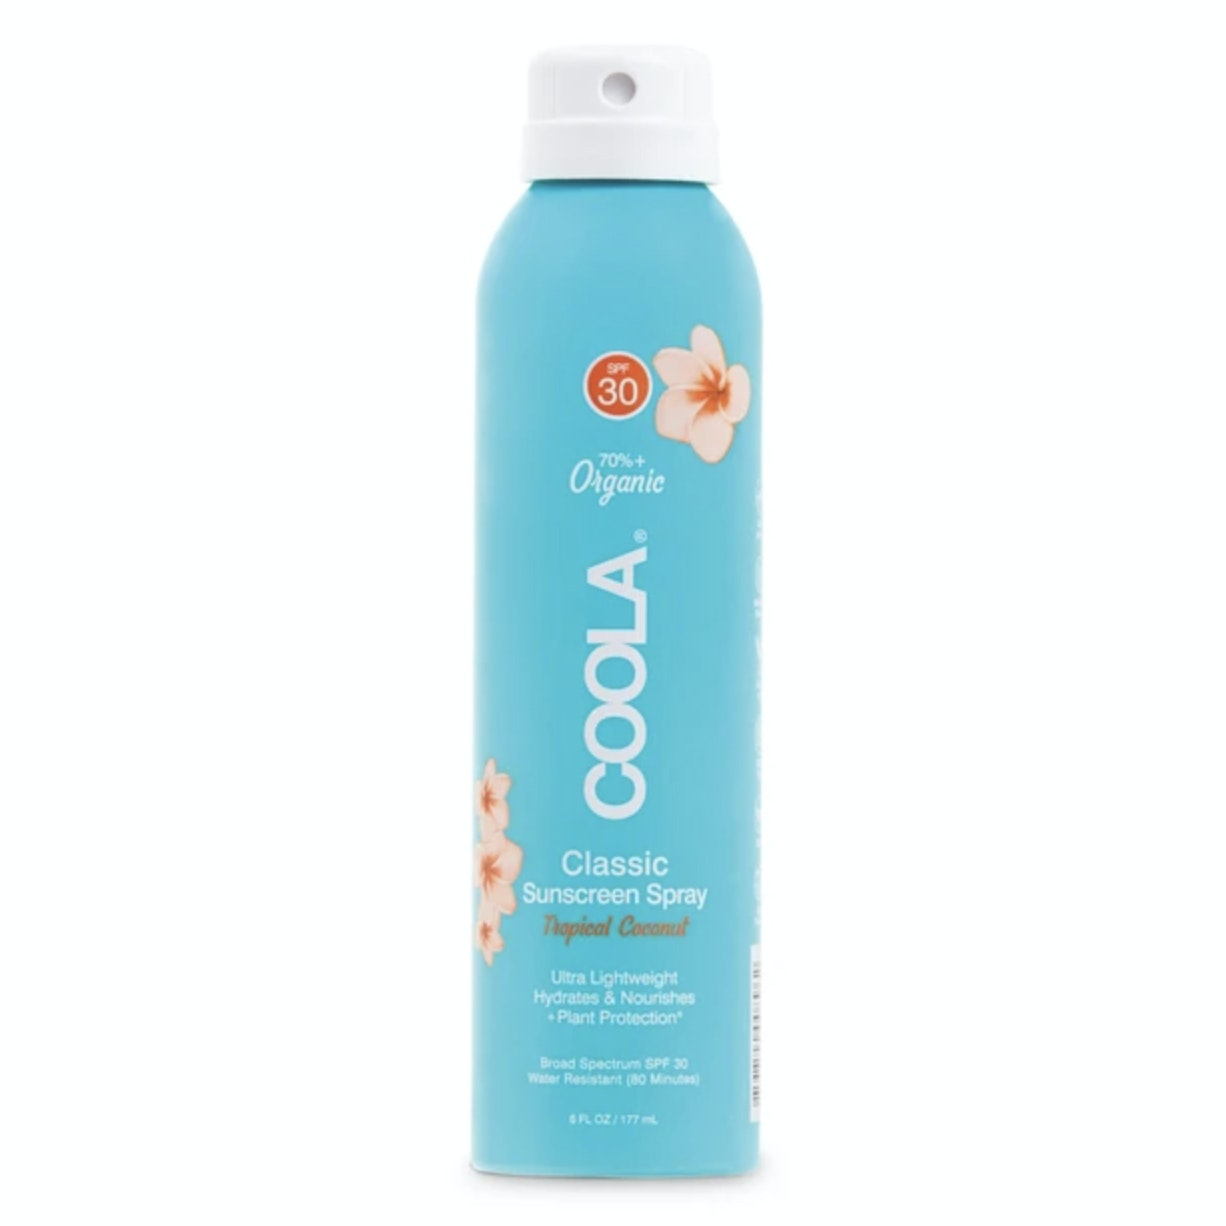 COOLA® Organic Sunscreen Body Spray in Tropical Coconut Broad Spectrum SPF 30